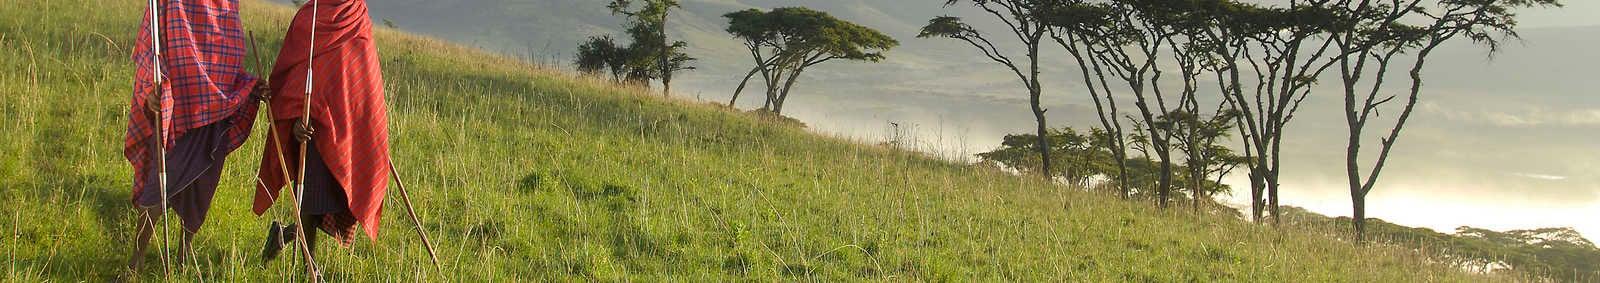 Ngorongoro Kirurumu sem-permanent tented camp views over the crater